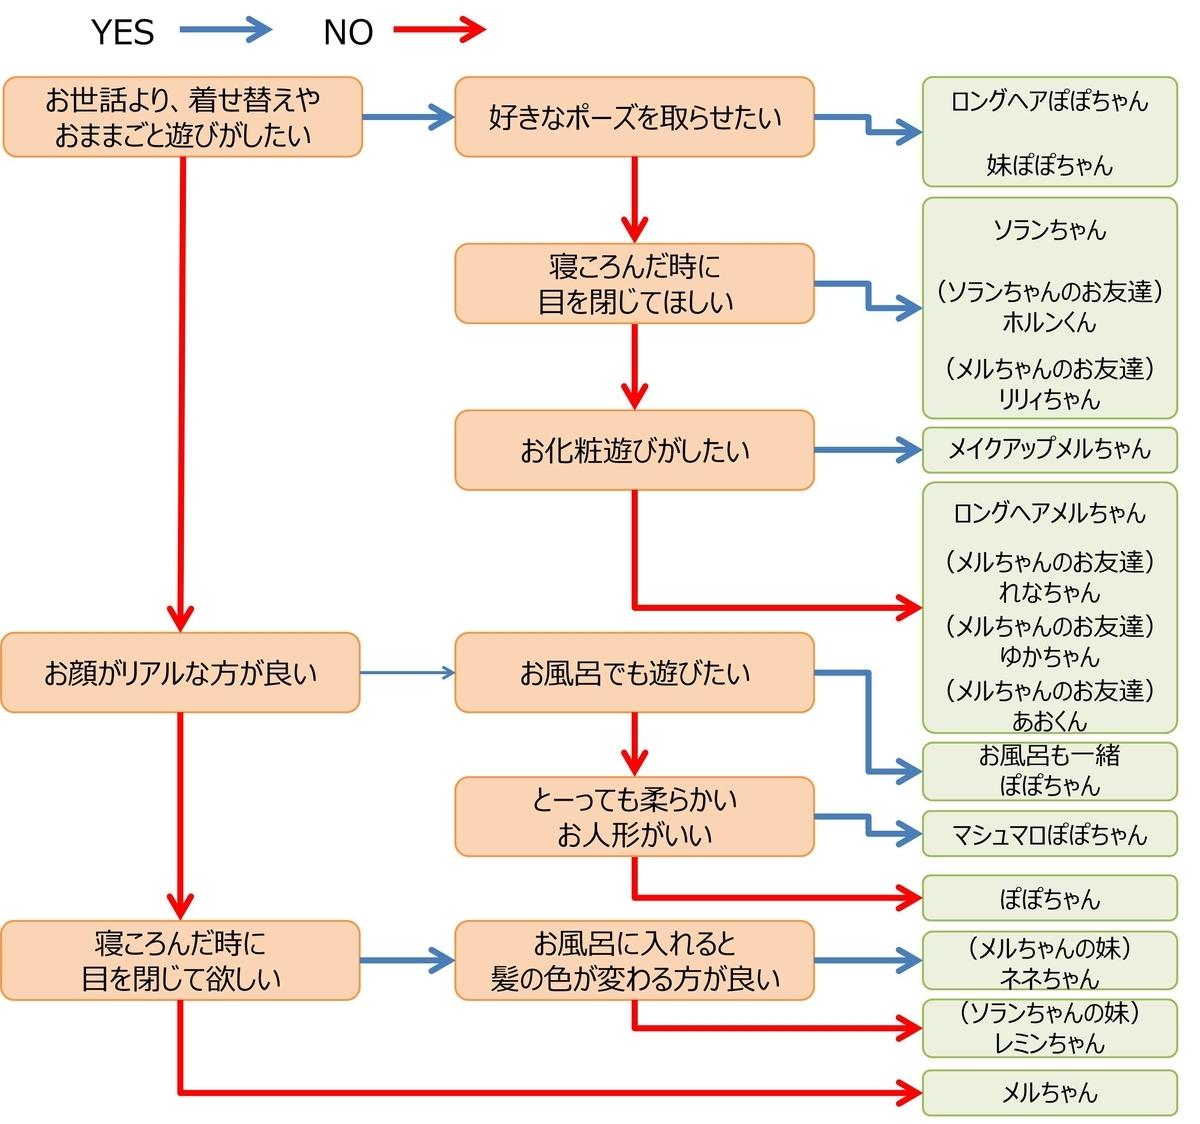 f:id:piyobu:20200221154821j:plain